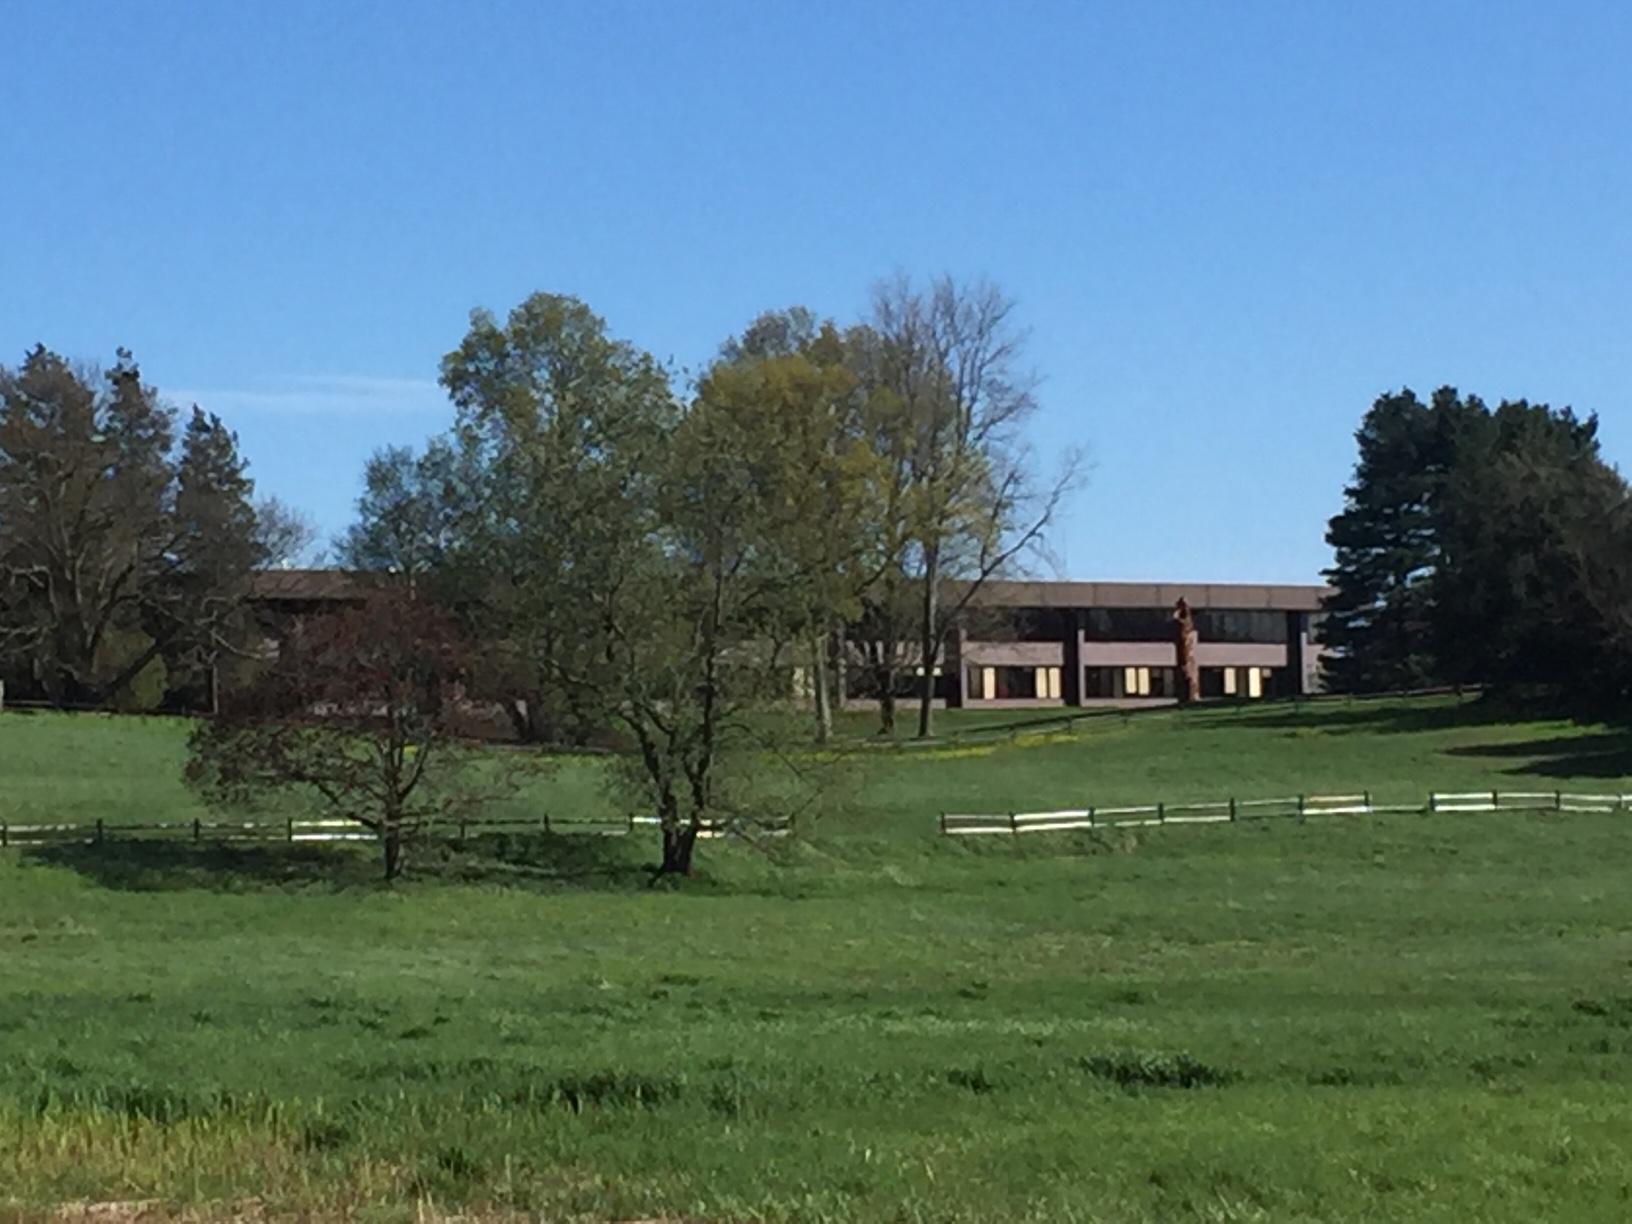 View of Terex's corporate headquarters in Westport, Connecticut.